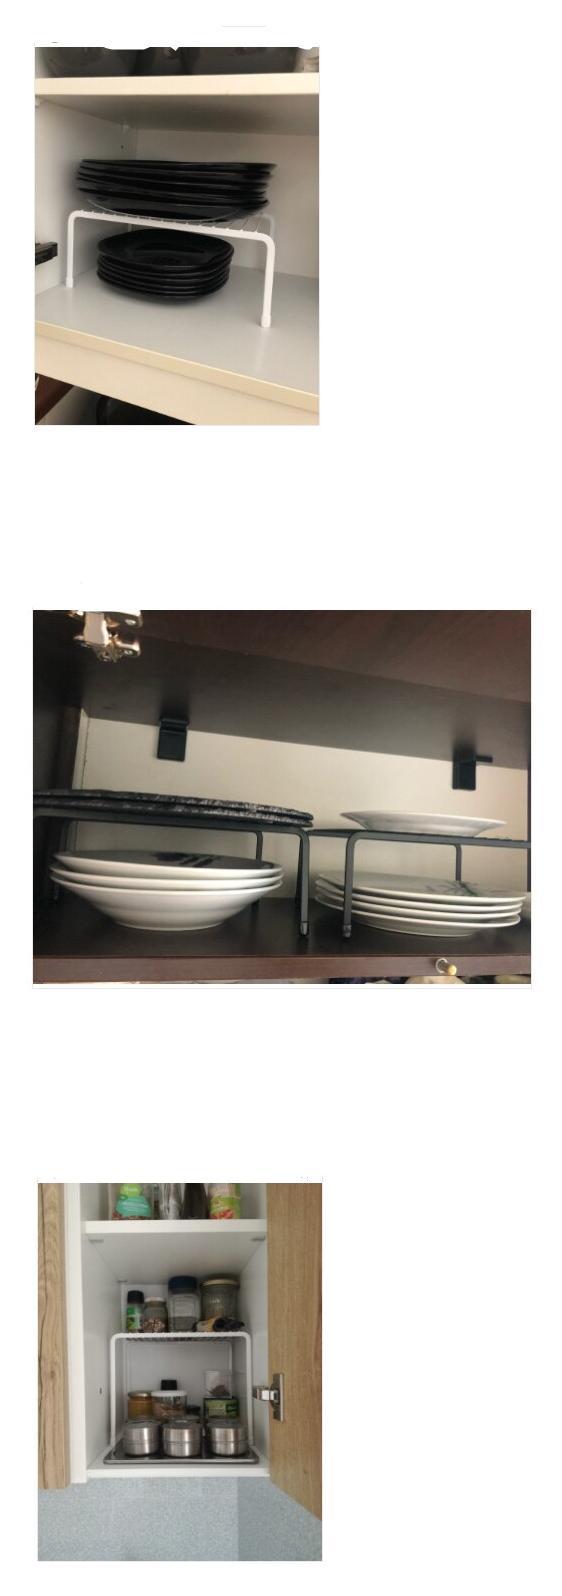 Iron Kitchen Storage Rack Closet Shelf Dish Drying Rack Spice Jars Holder Seasoning Bottles Shelves Spice Rack Kitchen Organizer